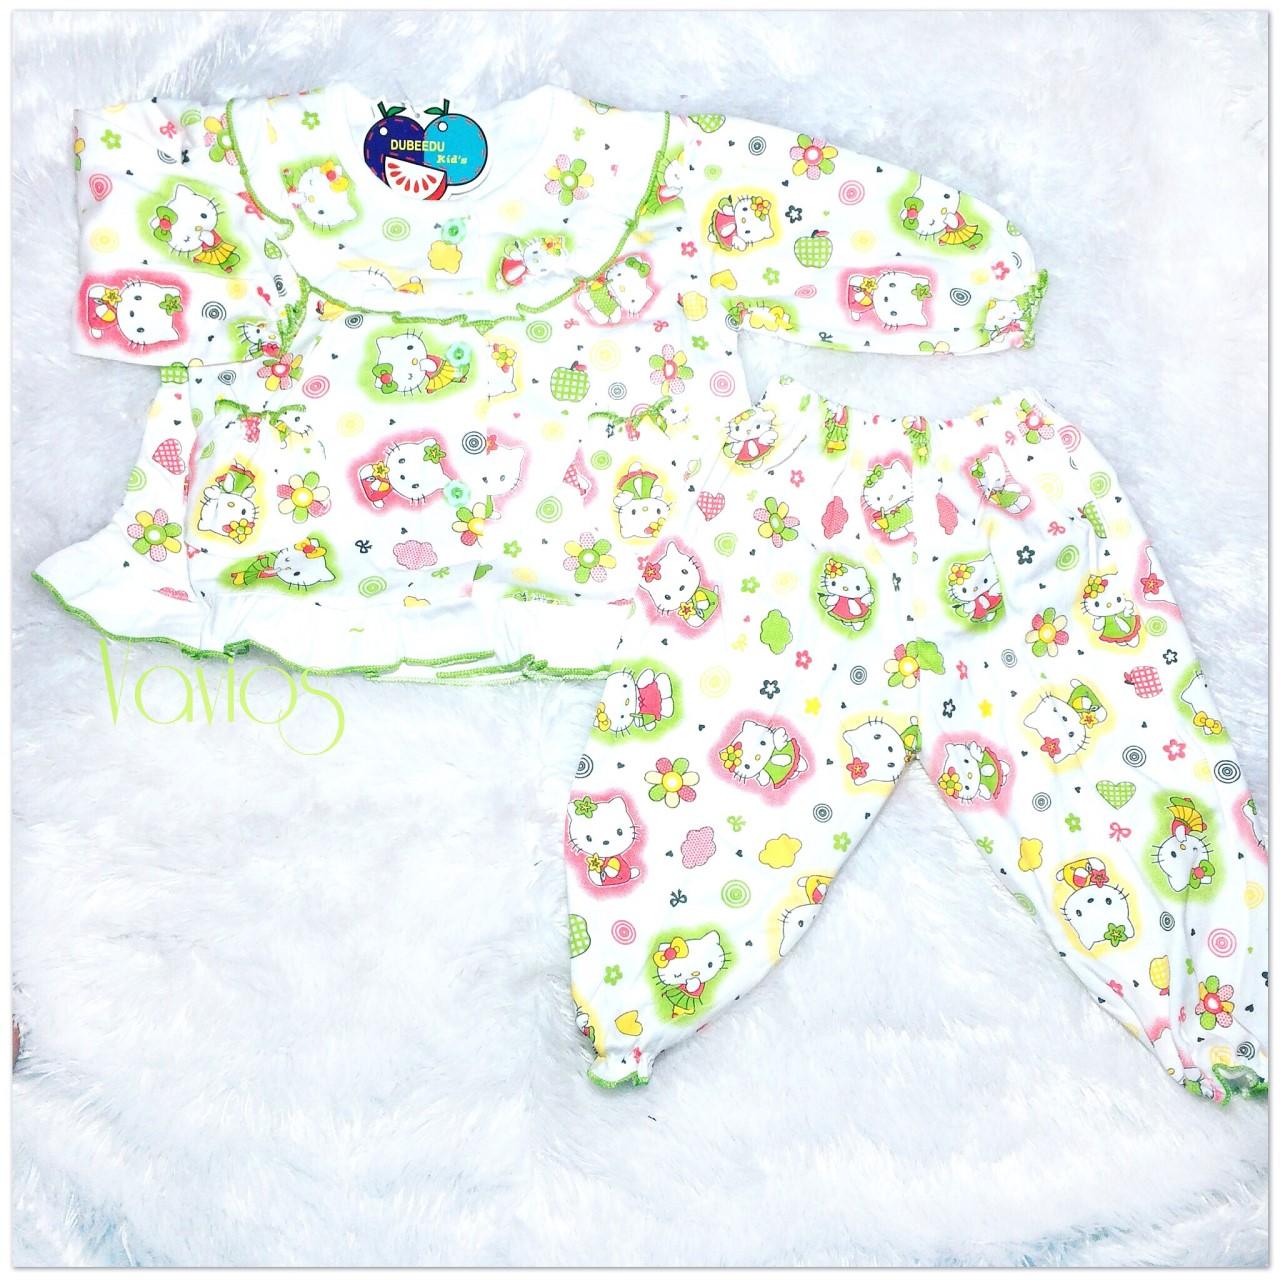 Vavios Shop Line Katalog Baju Hellokitty Sleep Wear Baby Girl Hello Kitty Tidur Anak